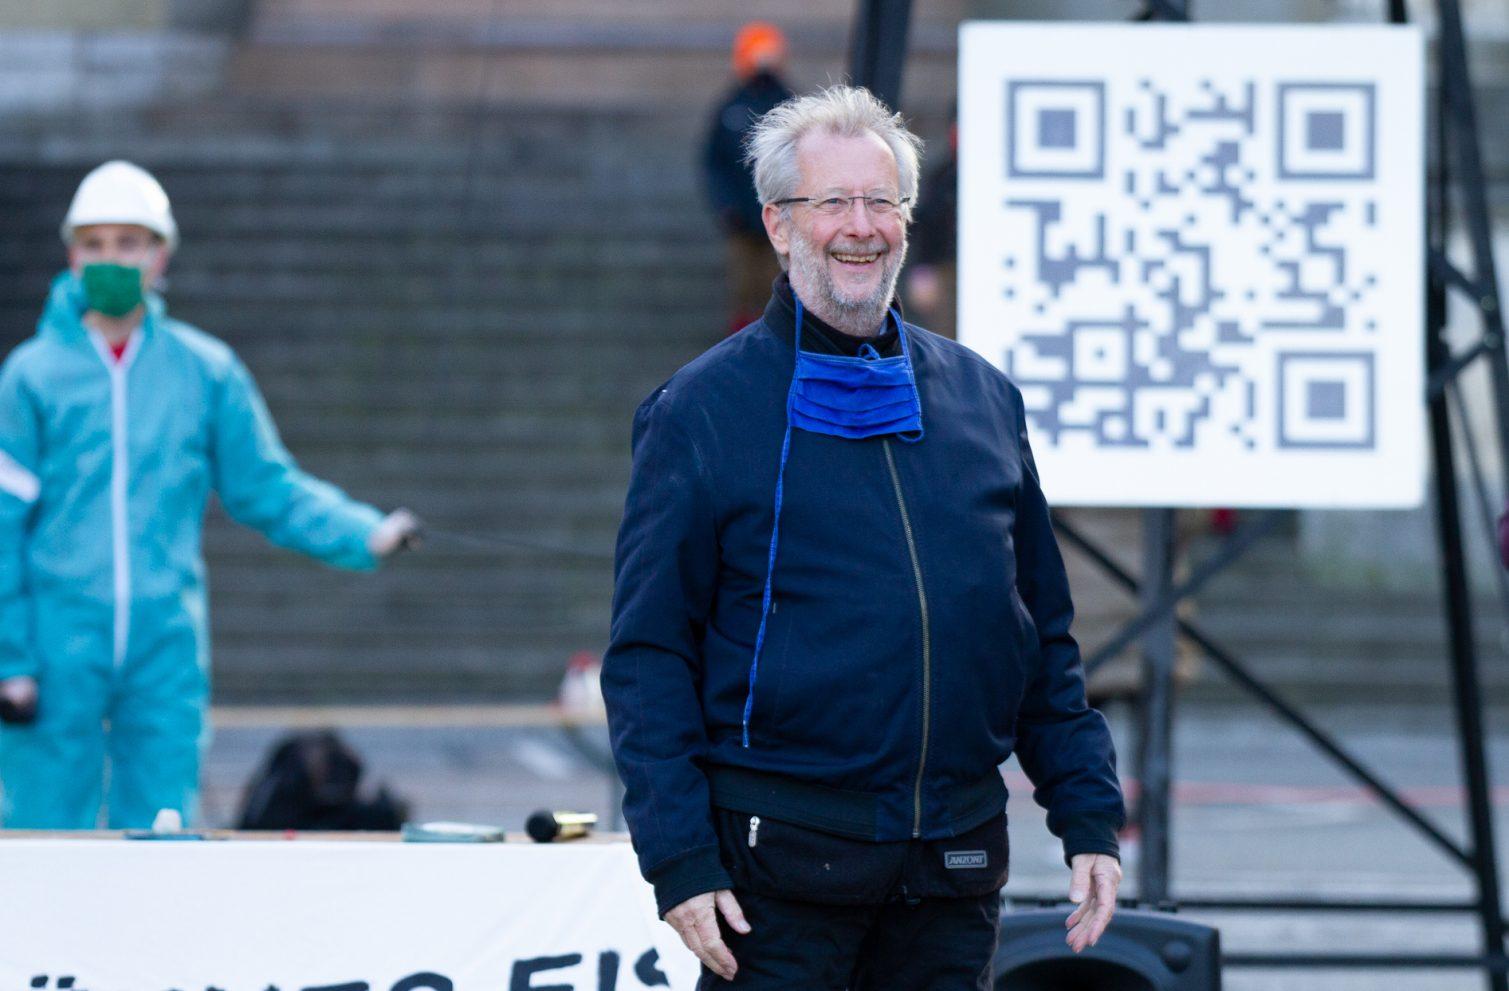 Dr. Helmiut Paschlau, Organisator der Protect the Planet Vortragsreihe